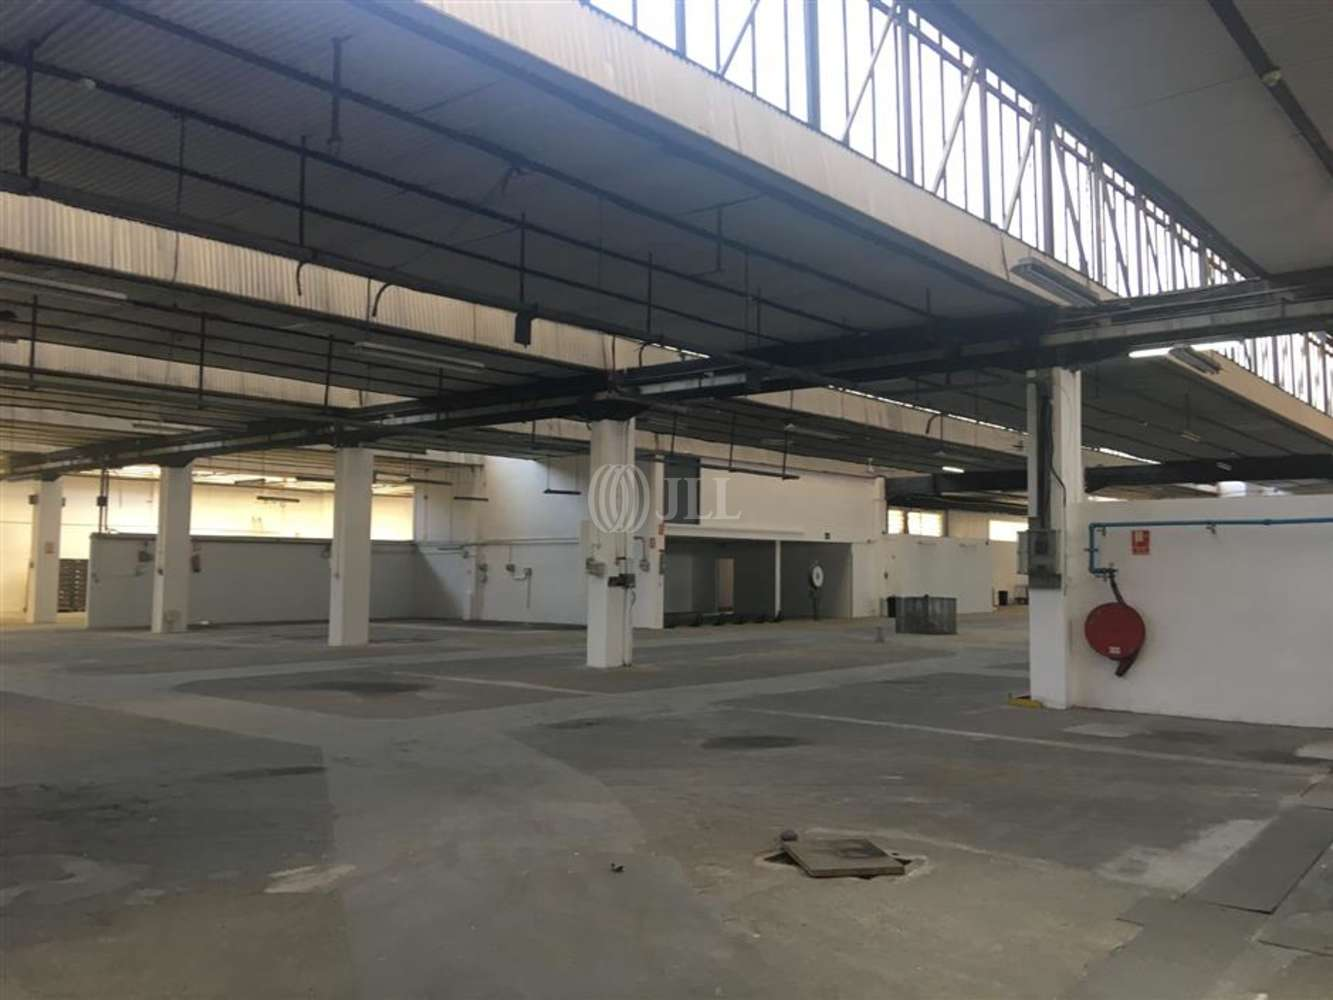 Naves industriales y logísticas Sant boi de llobregat, 08830 - Nave Industrial - B0412 - PI FONOLLAR NORD